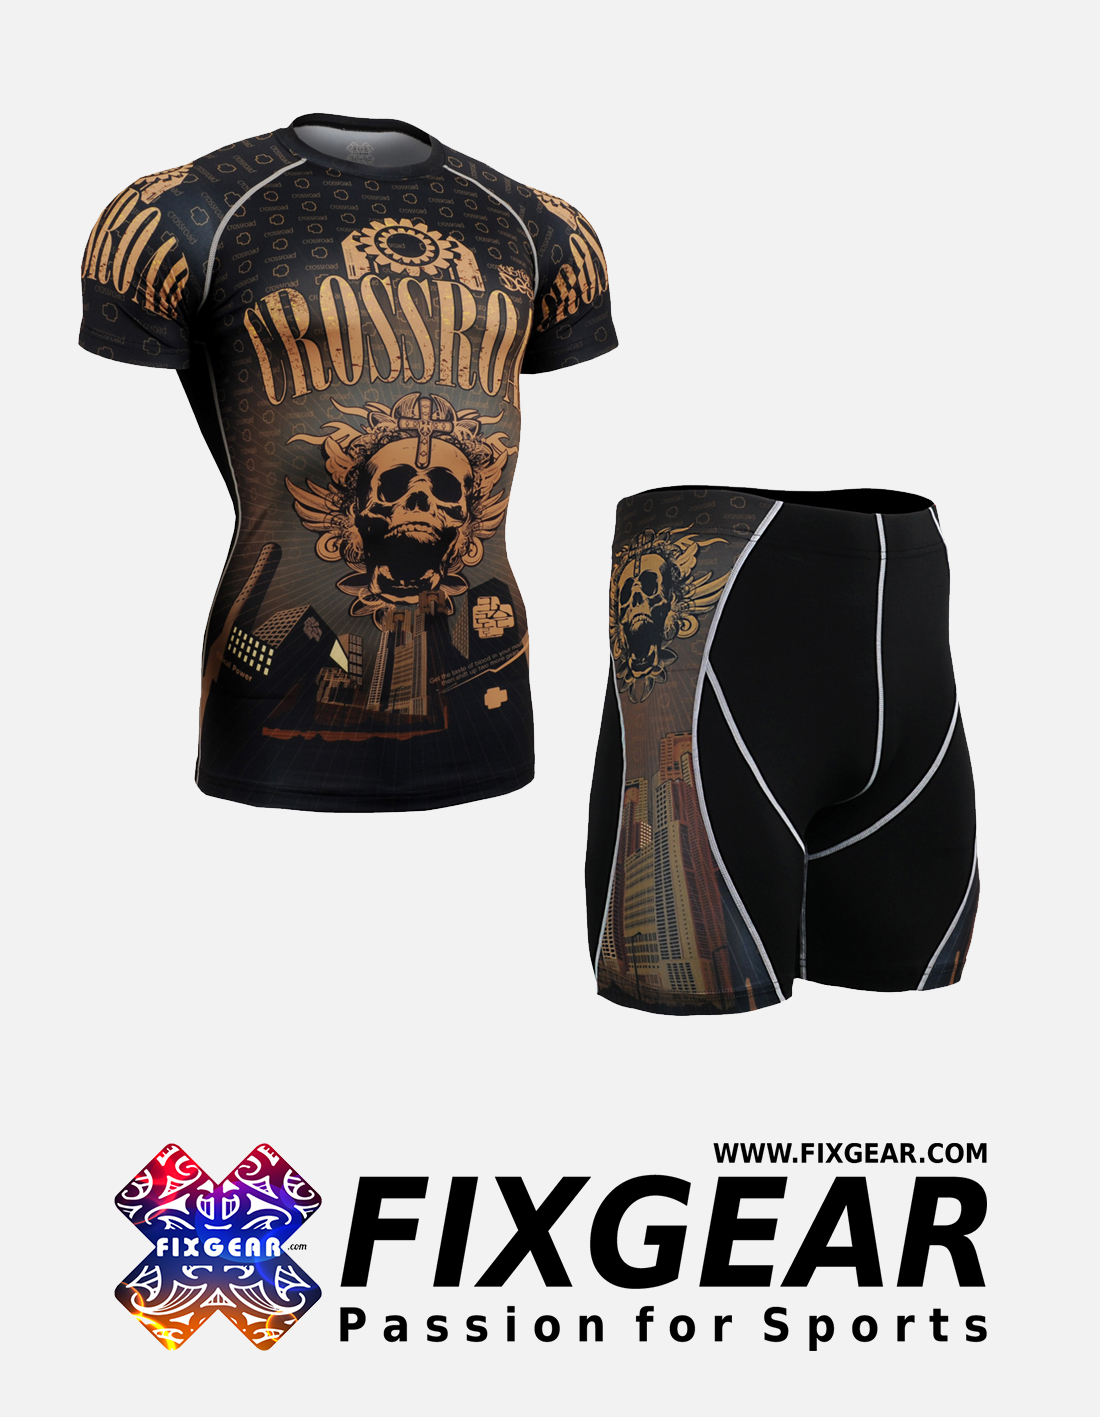 FIXGEAR CFS-P2S-B27 Set Compression Base Layer Shirt & Compression Drawer Shorts